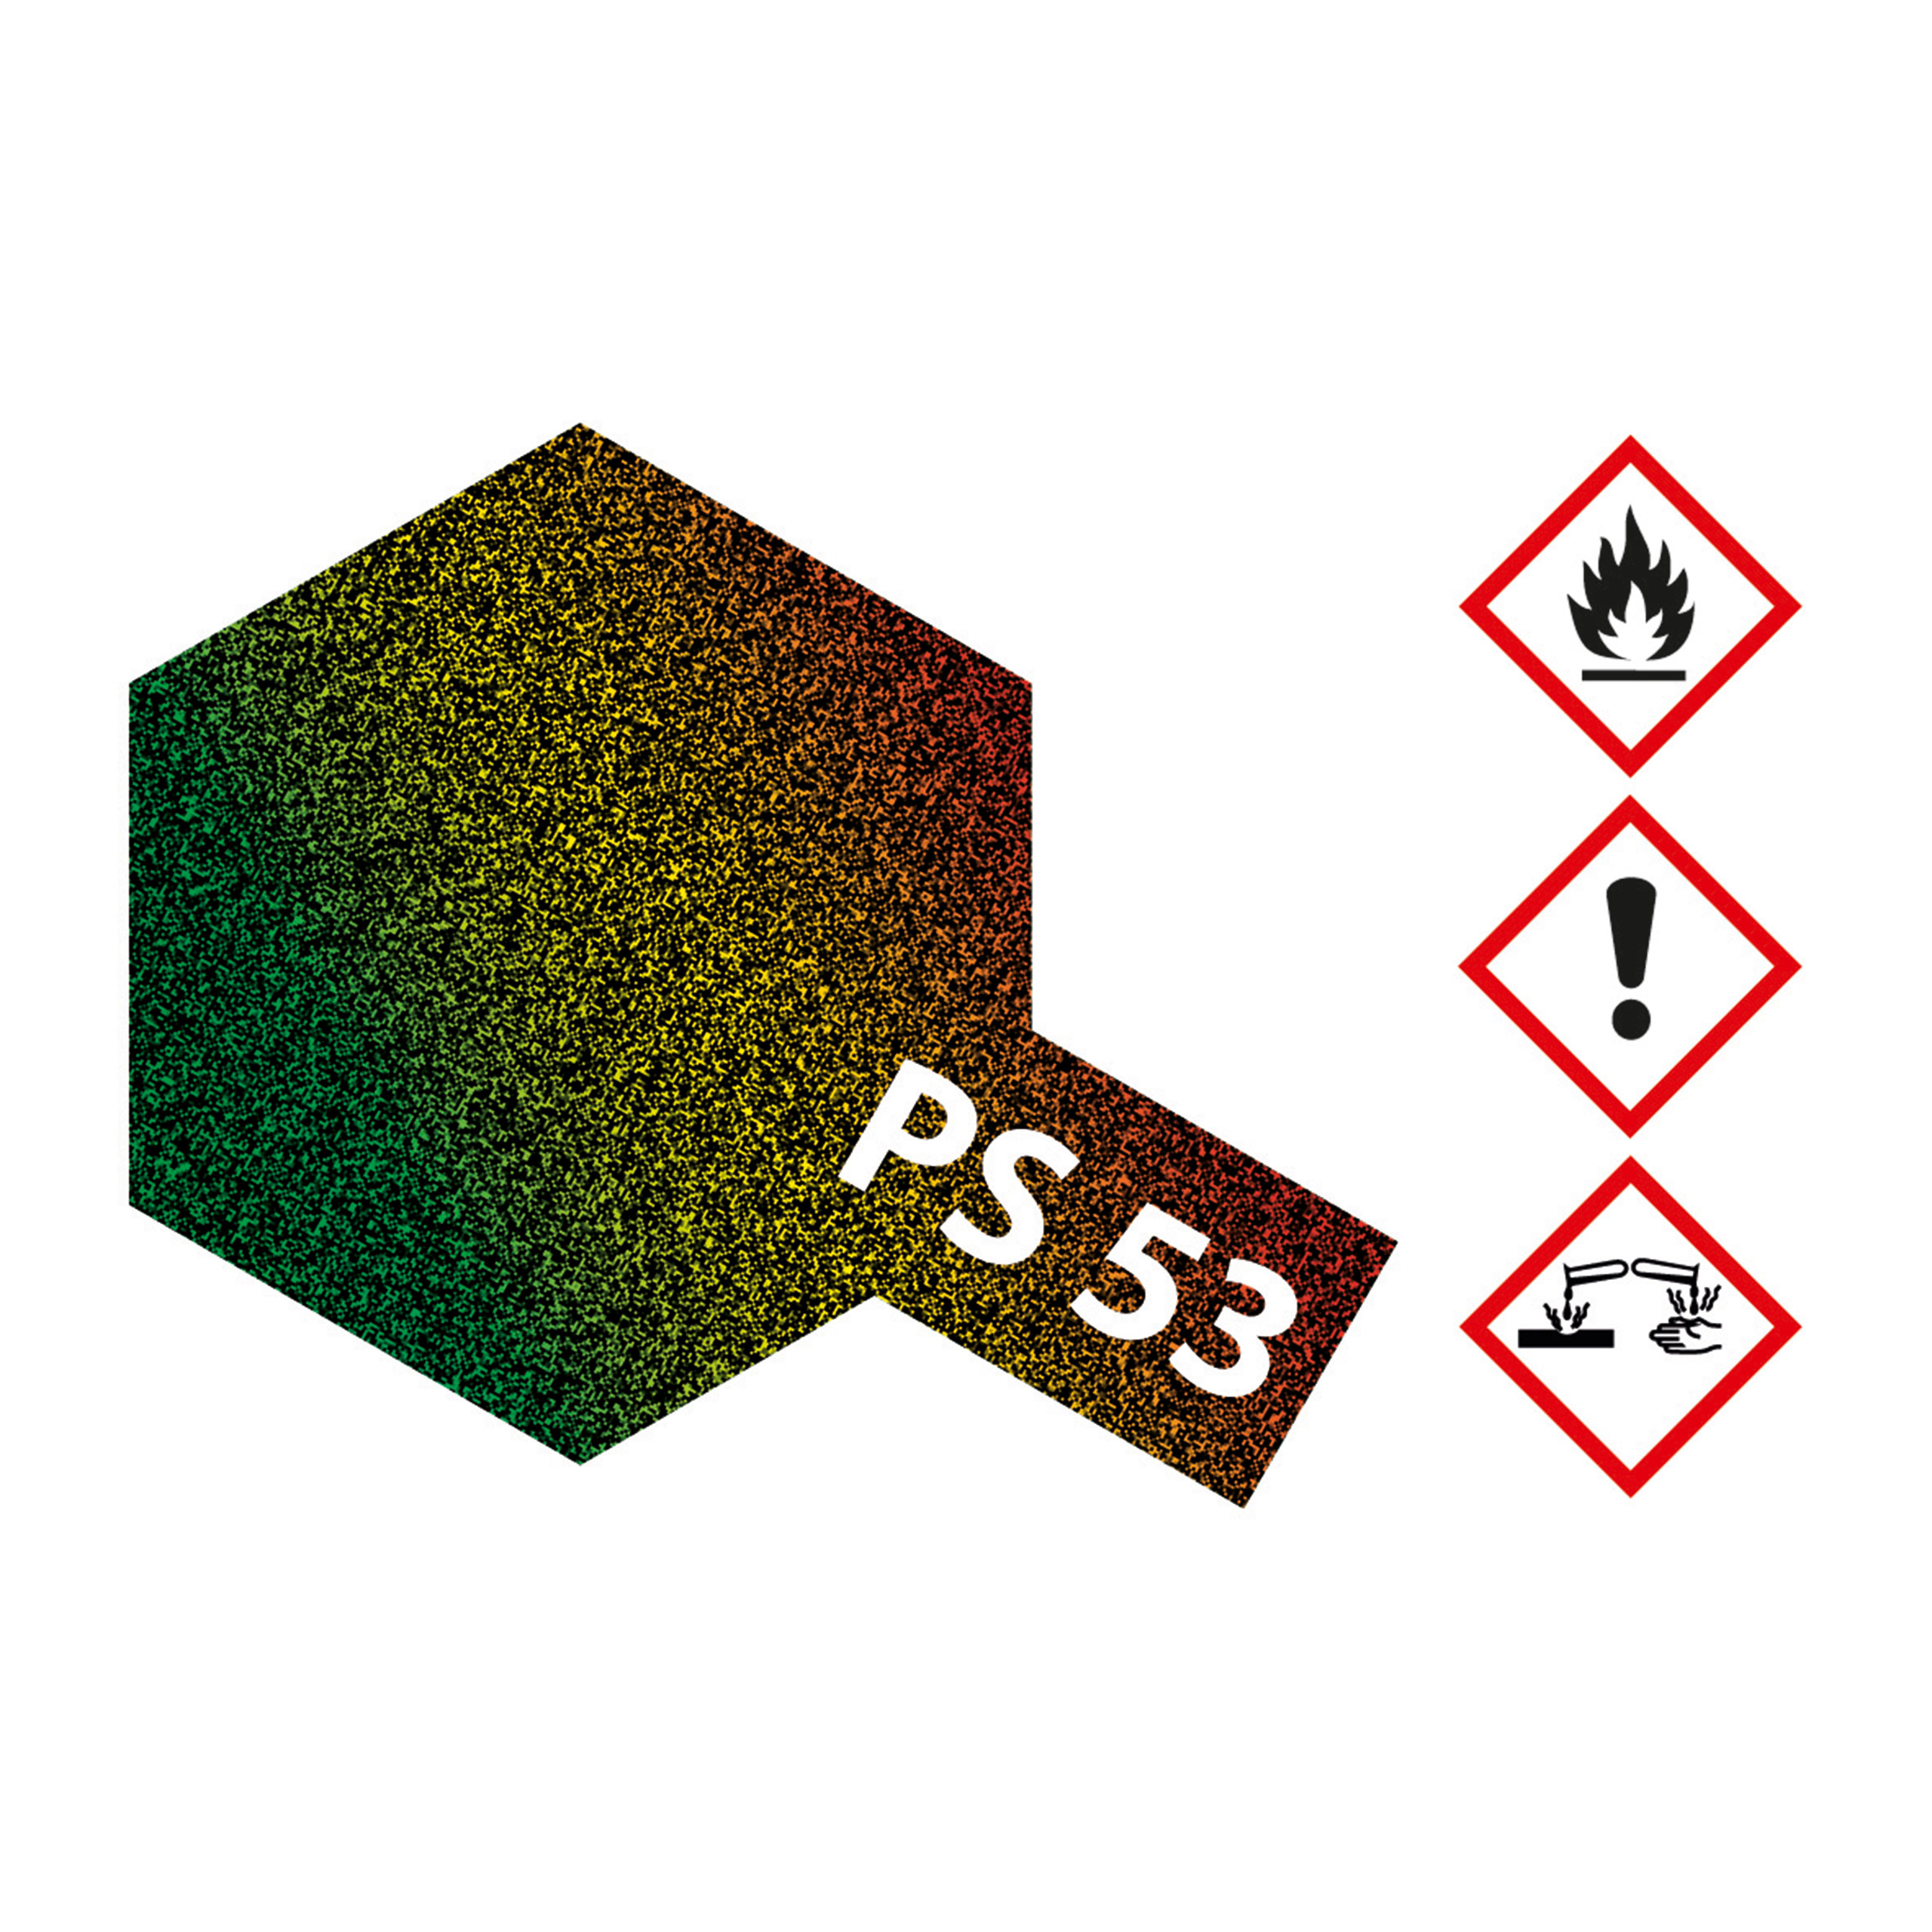 PS-53 Lame Flake Transp.schil.Poly. - 100ml Sprayfarbe Lexan - Tamiya 300086053